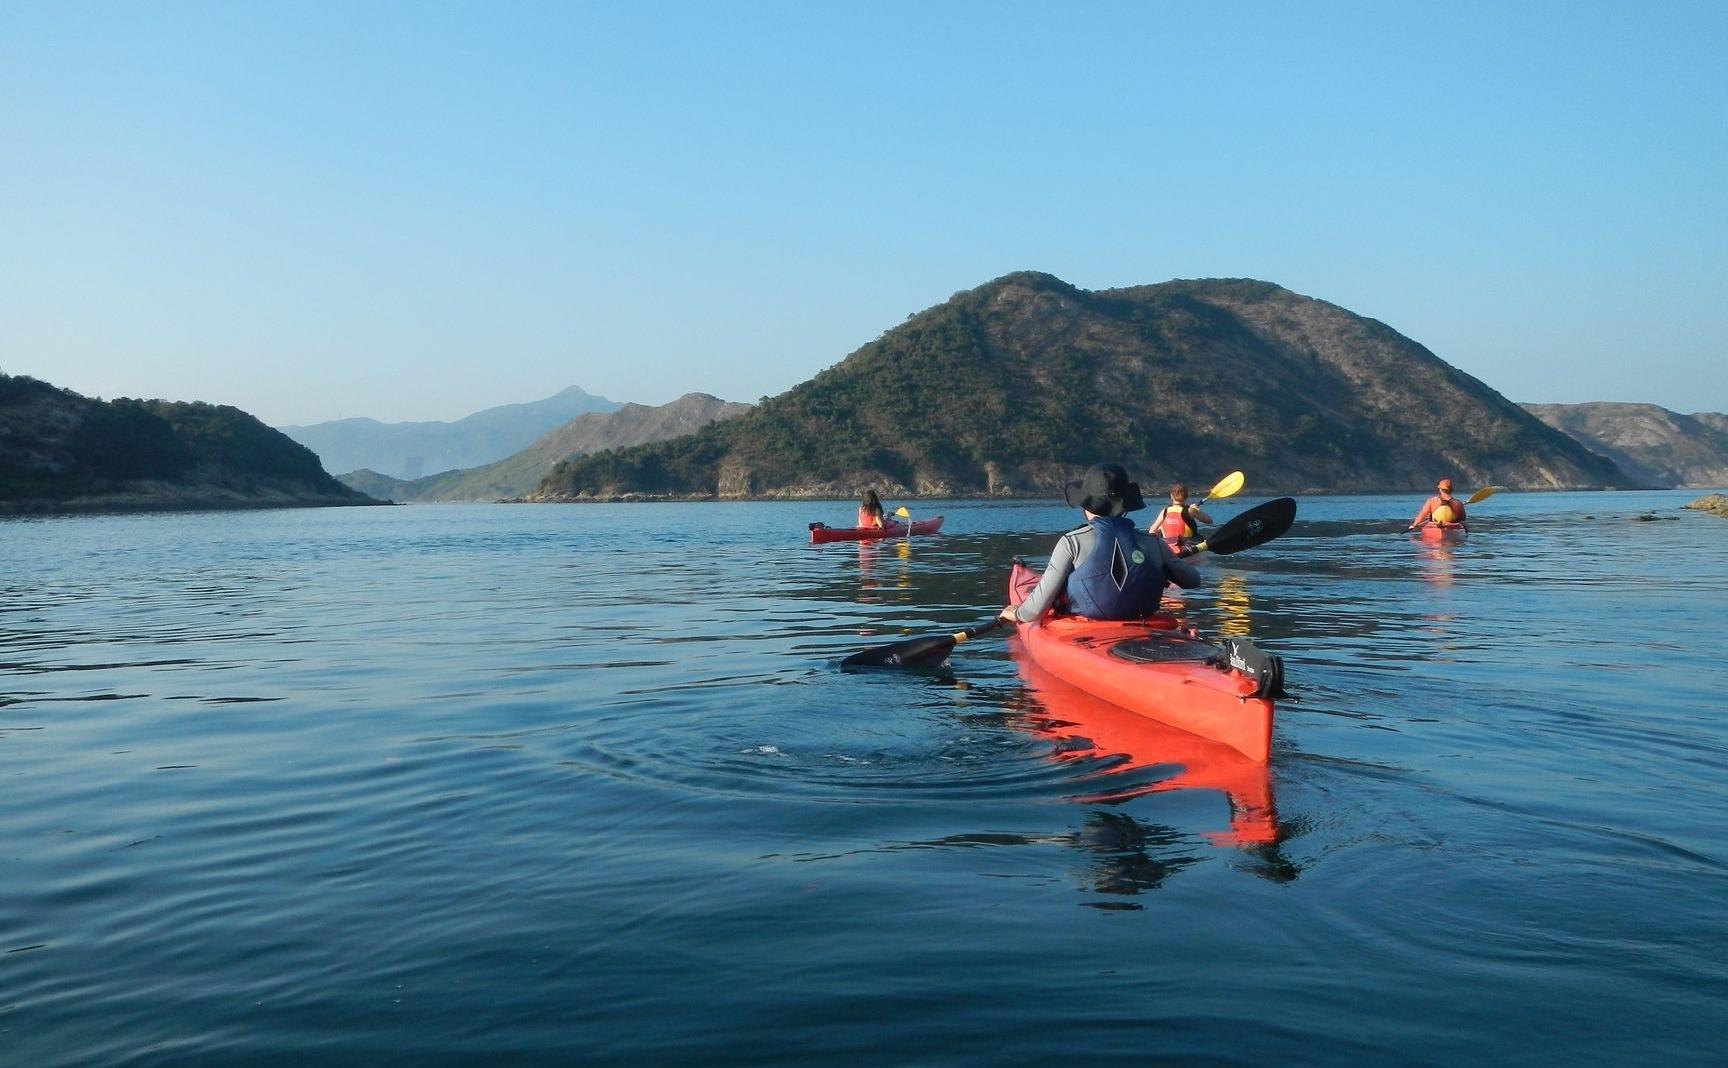 Best kayaking spots in Hong Kong